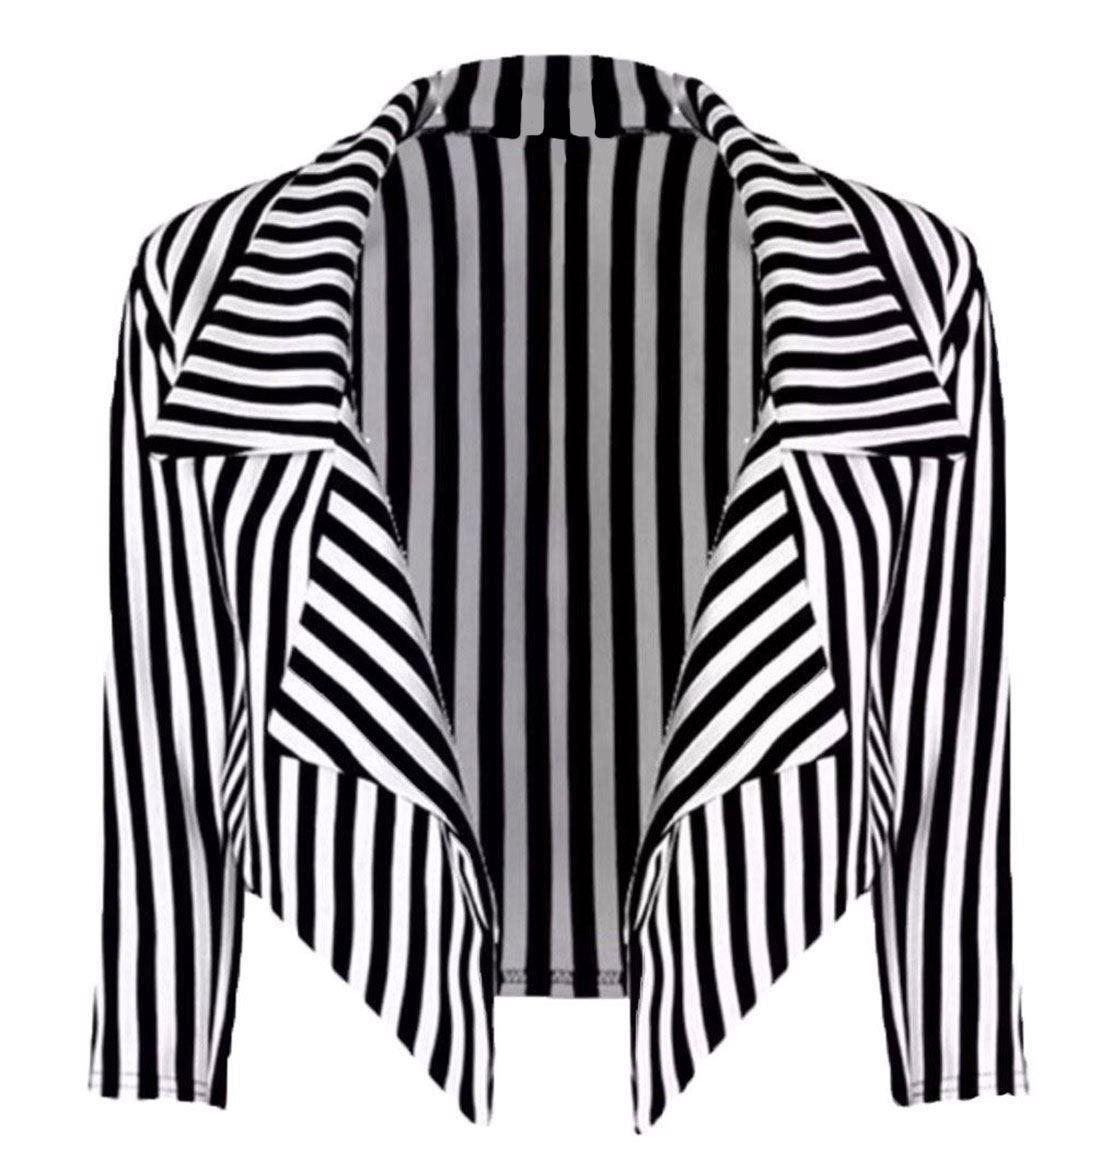 Rimi Hanger Womens Black & White Striped Waterfall Cropped Blazer Jacket S/XXL